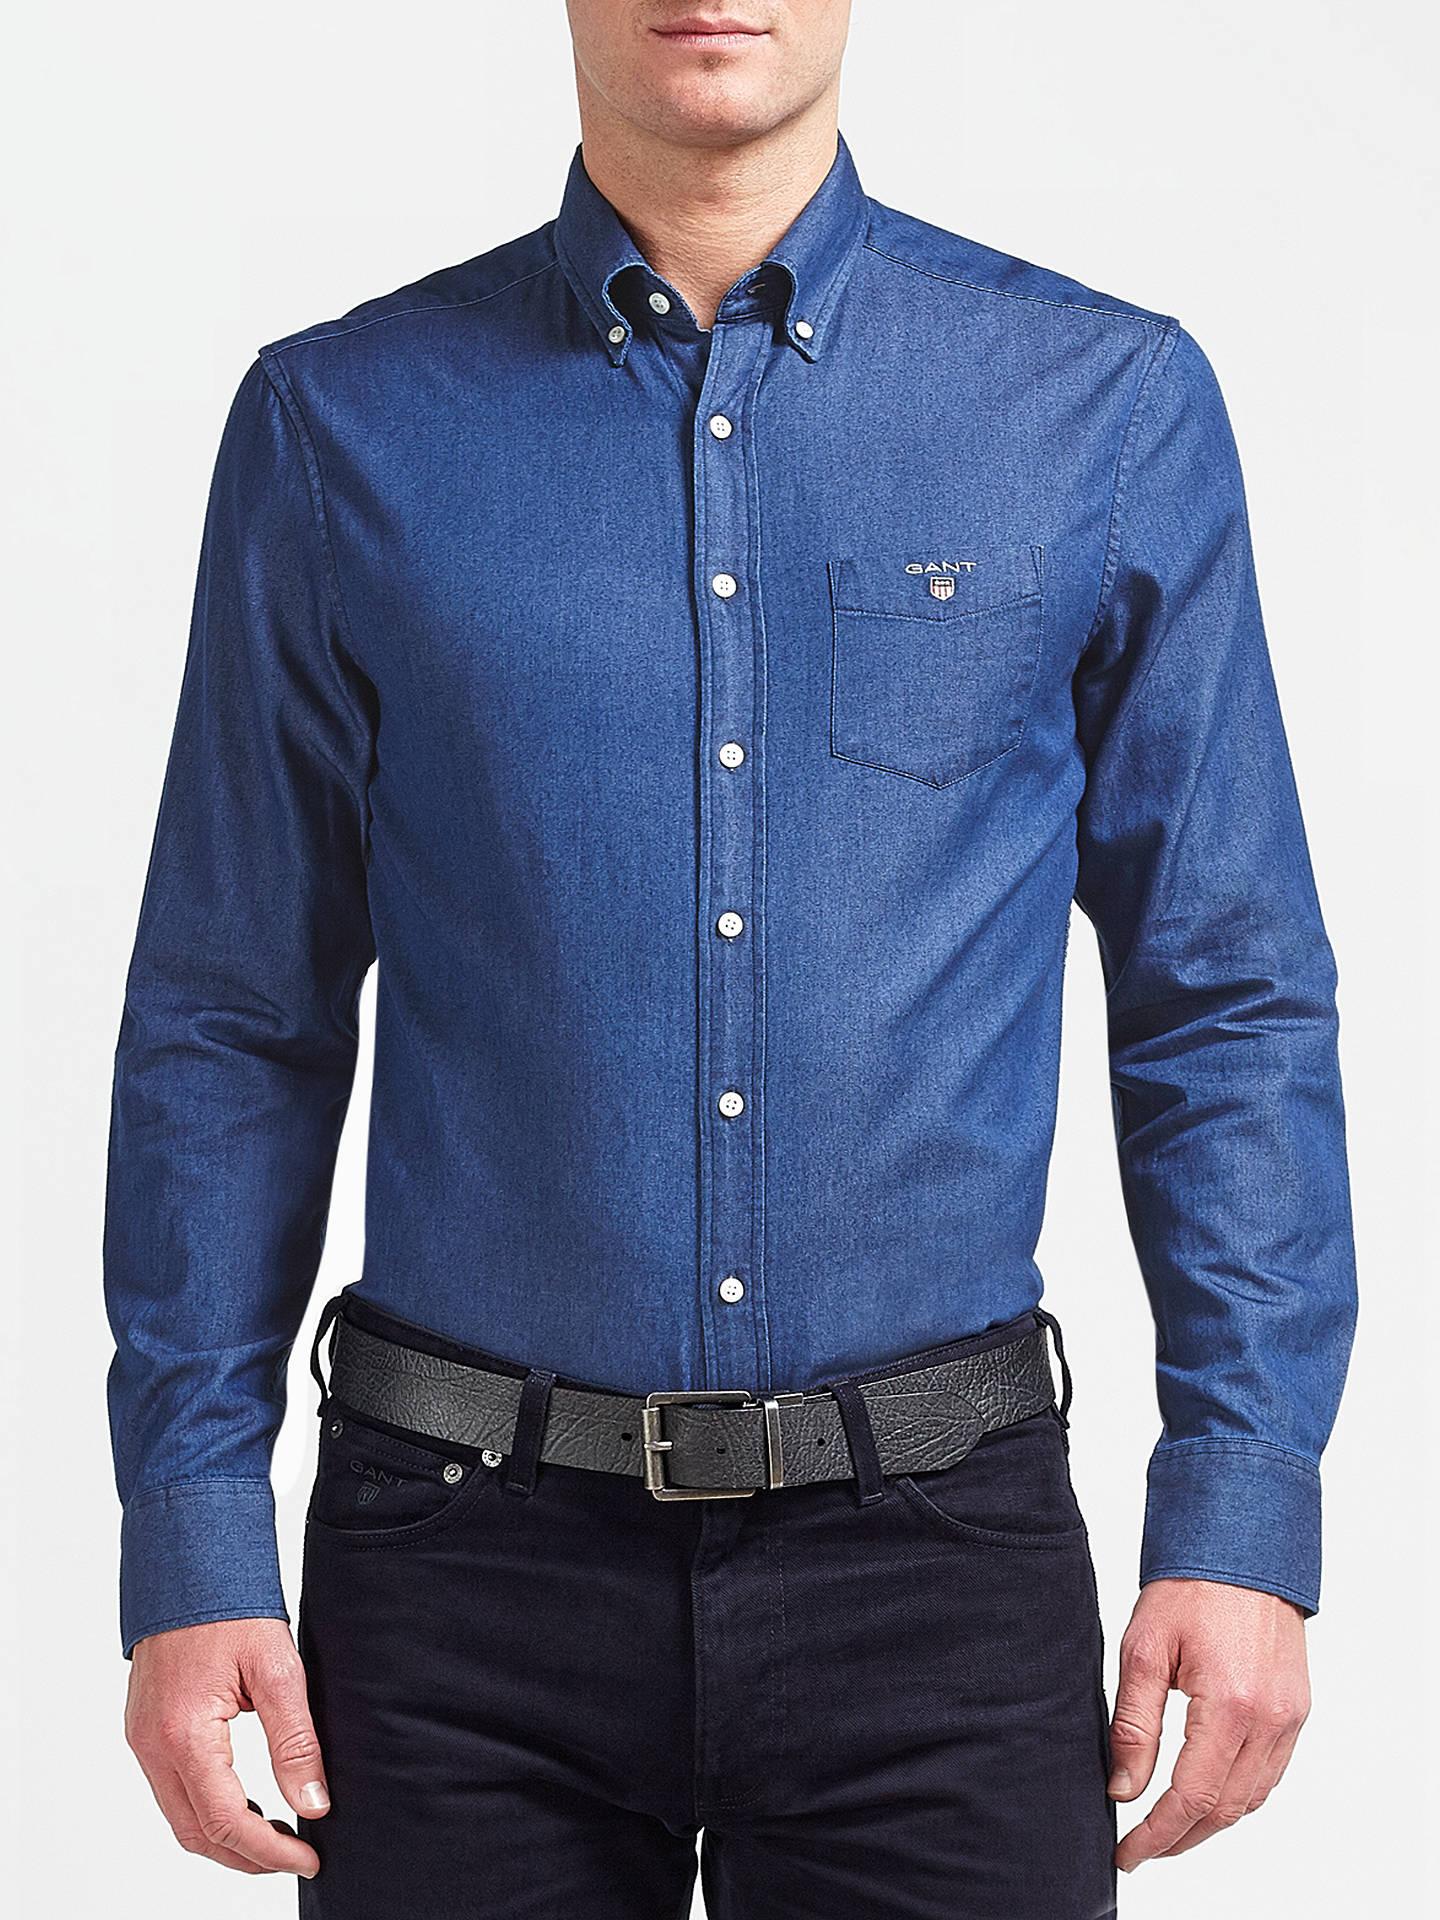 243c52aee7a Buy Gant Indigo Long Sleeve Shirt